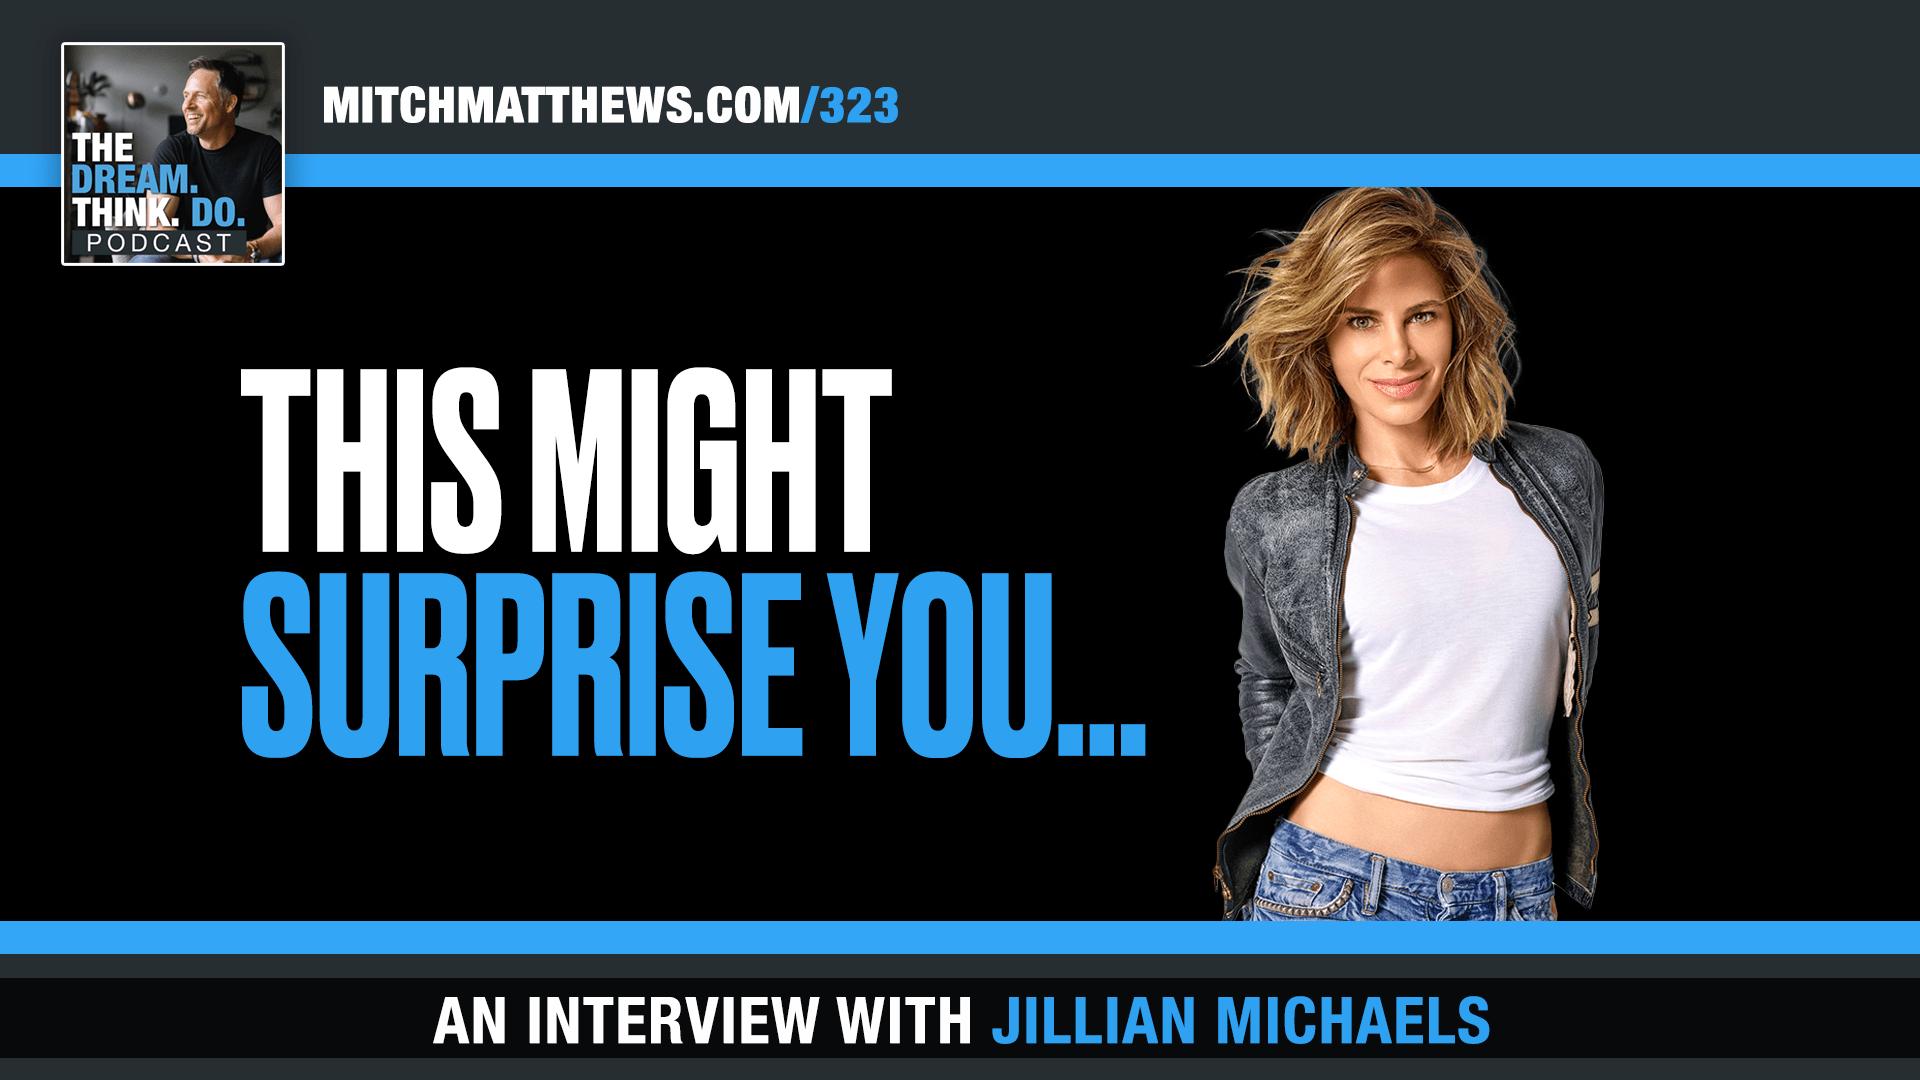 Jillian Michaels Interview with MitchMatthews